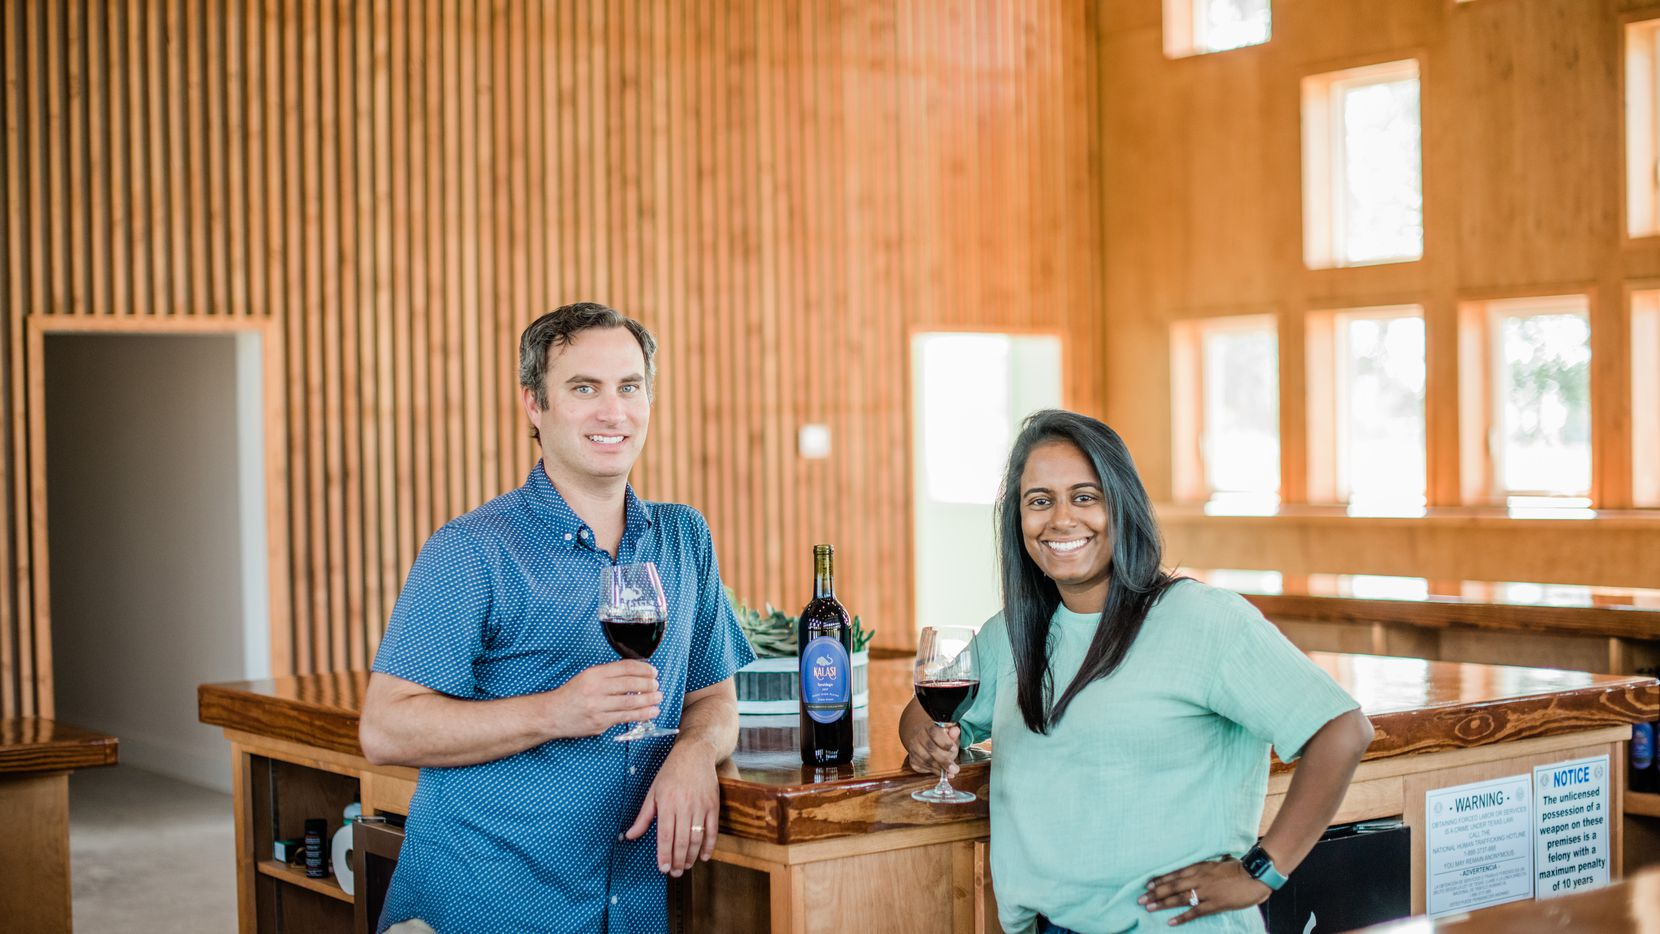 Greg and Nikhila Narra Davis debut their new Kalasi Cellars tasting room in Fredericksburg.